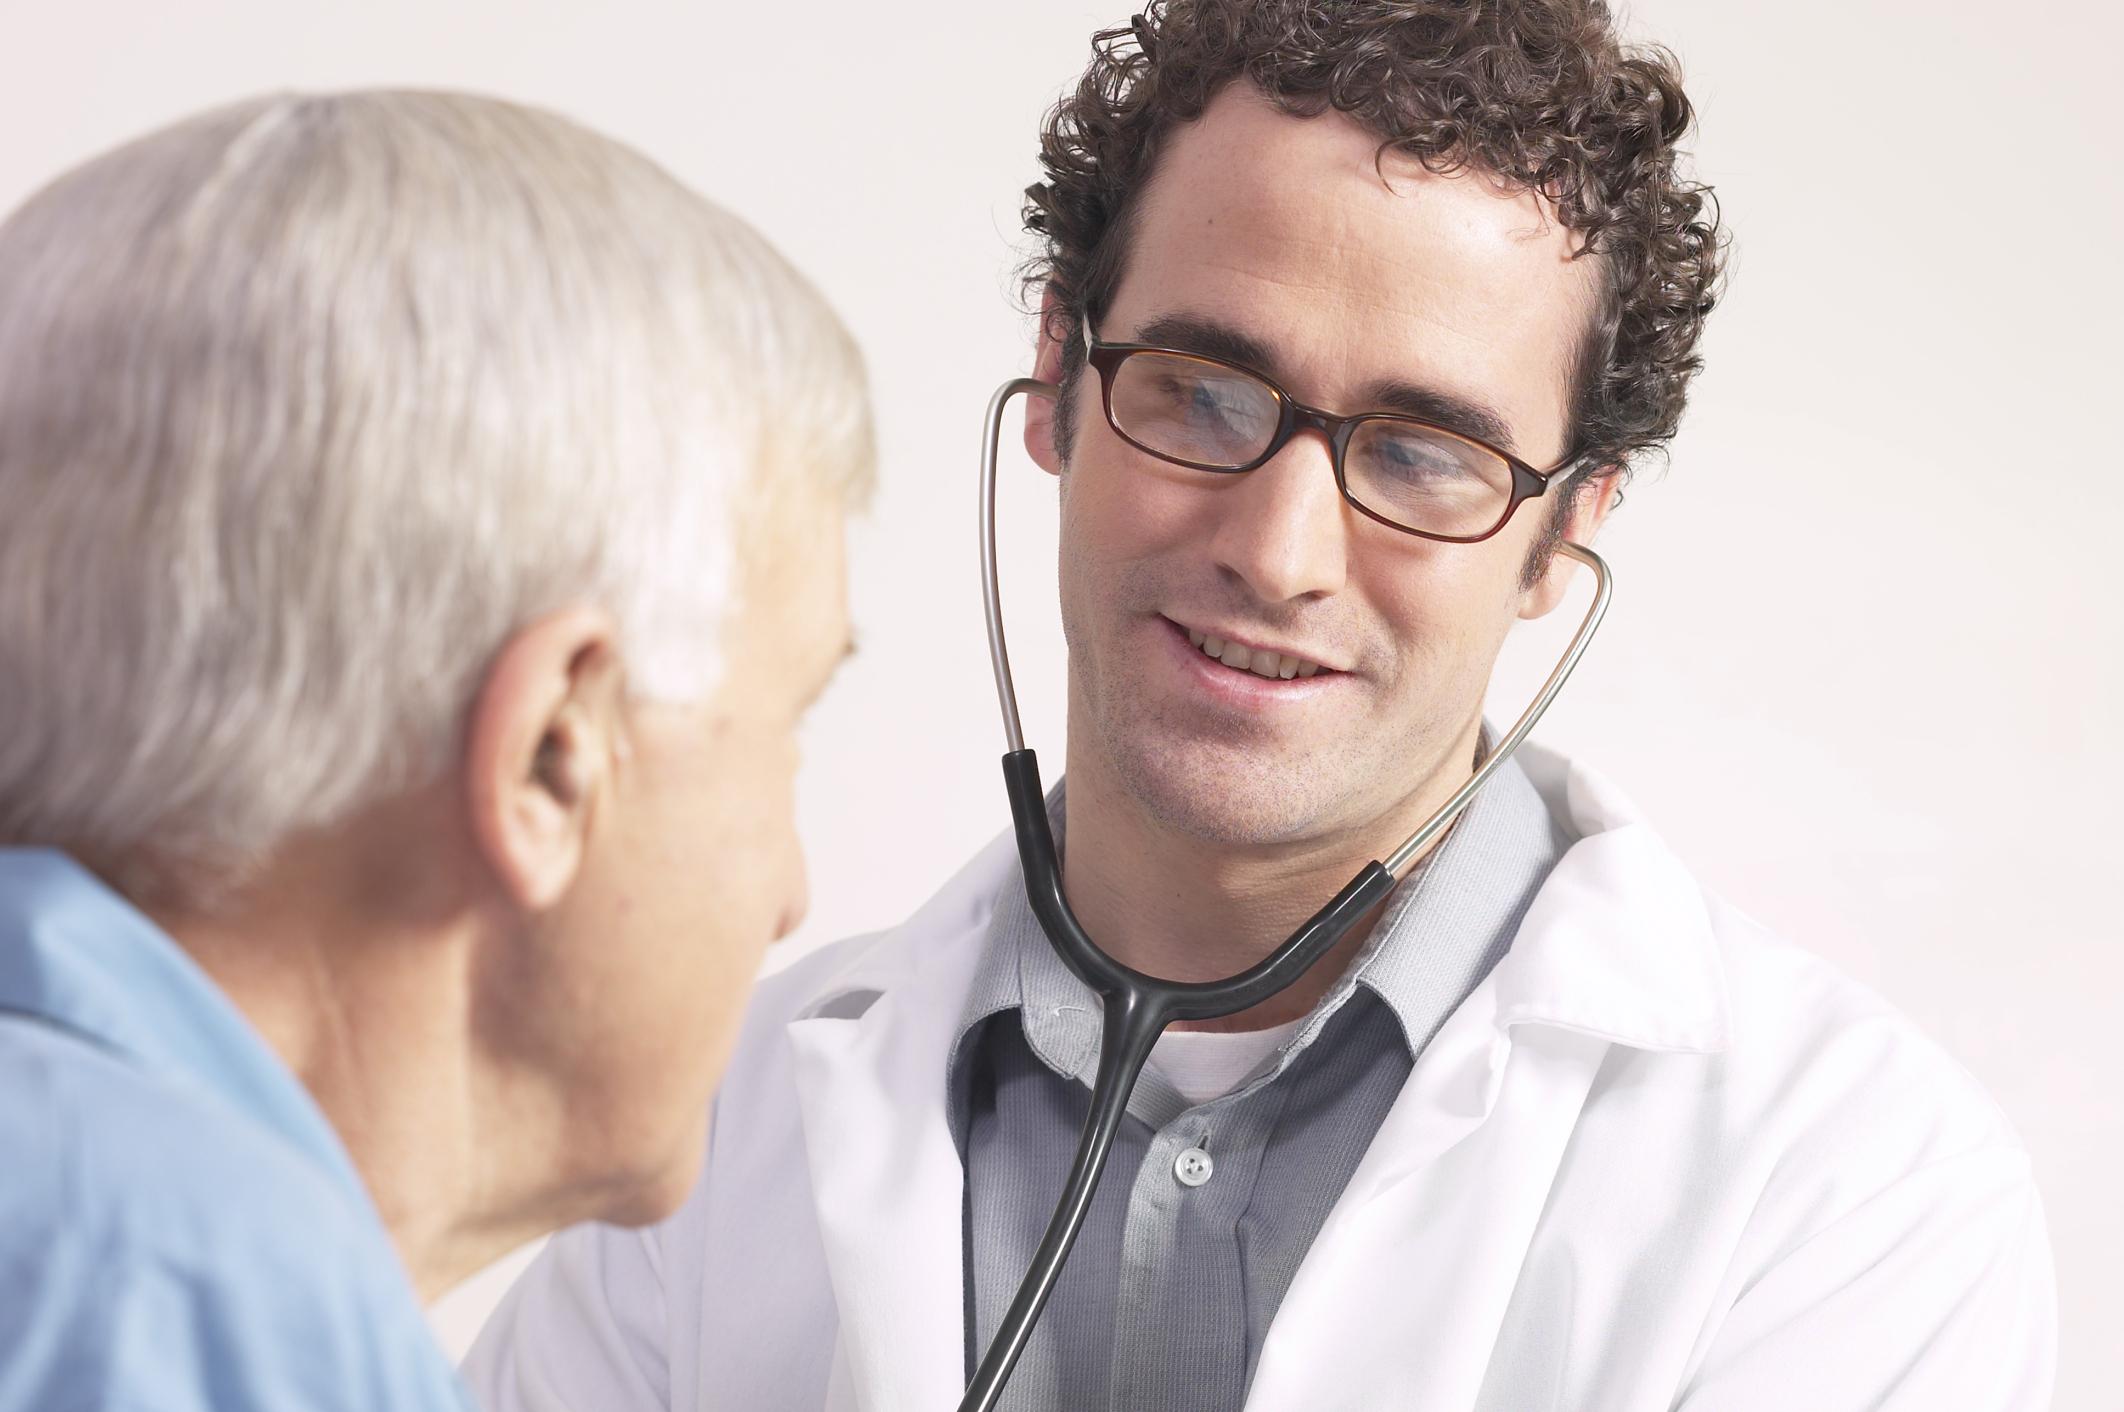 universal healthcare persuasive essay